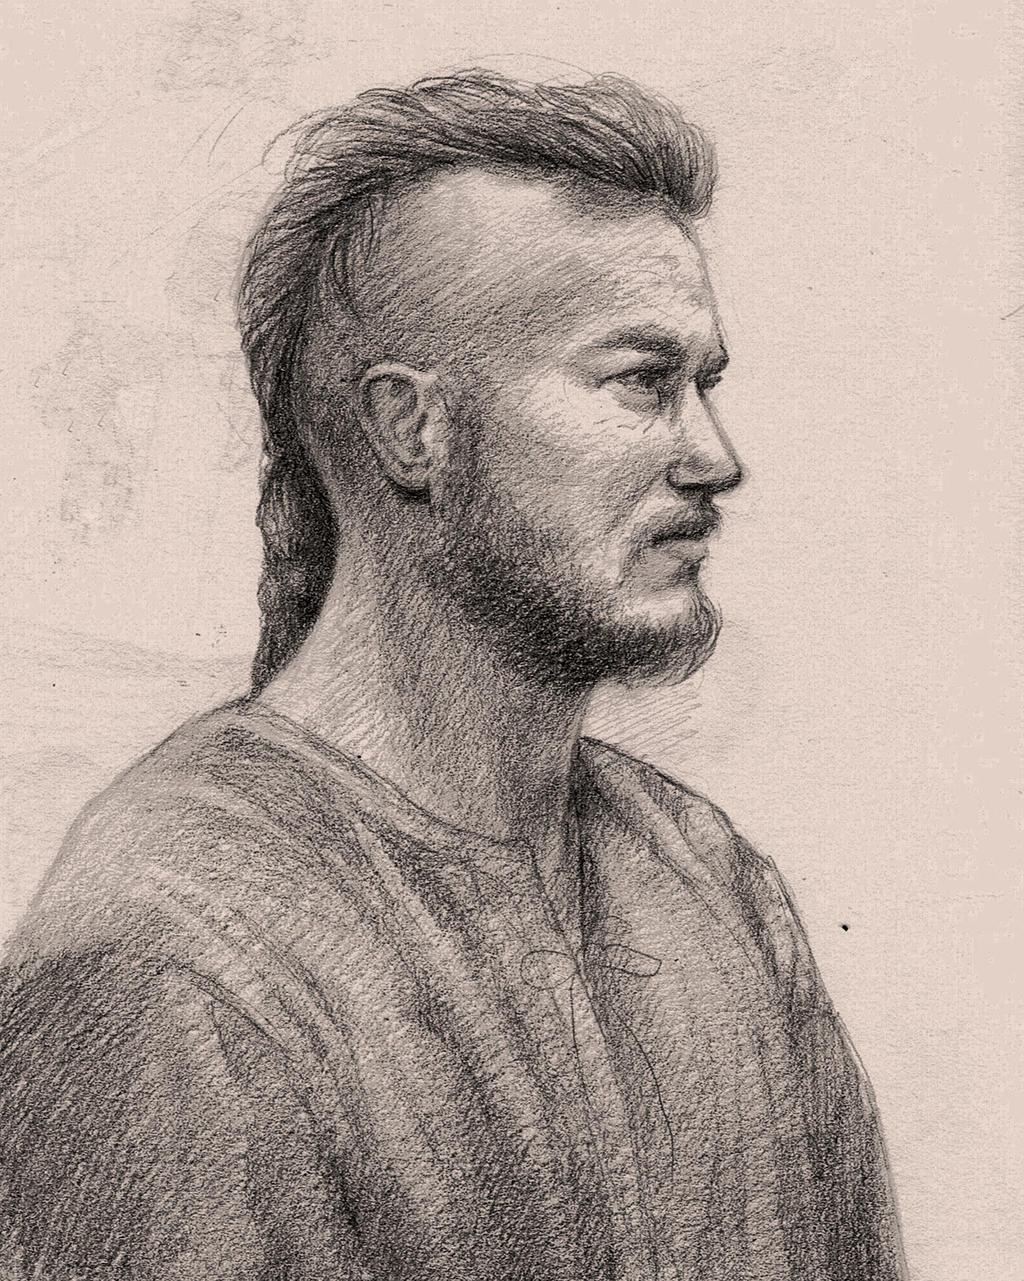 Ragnar Lothbrok Sketch By Nooko On DeviantArt